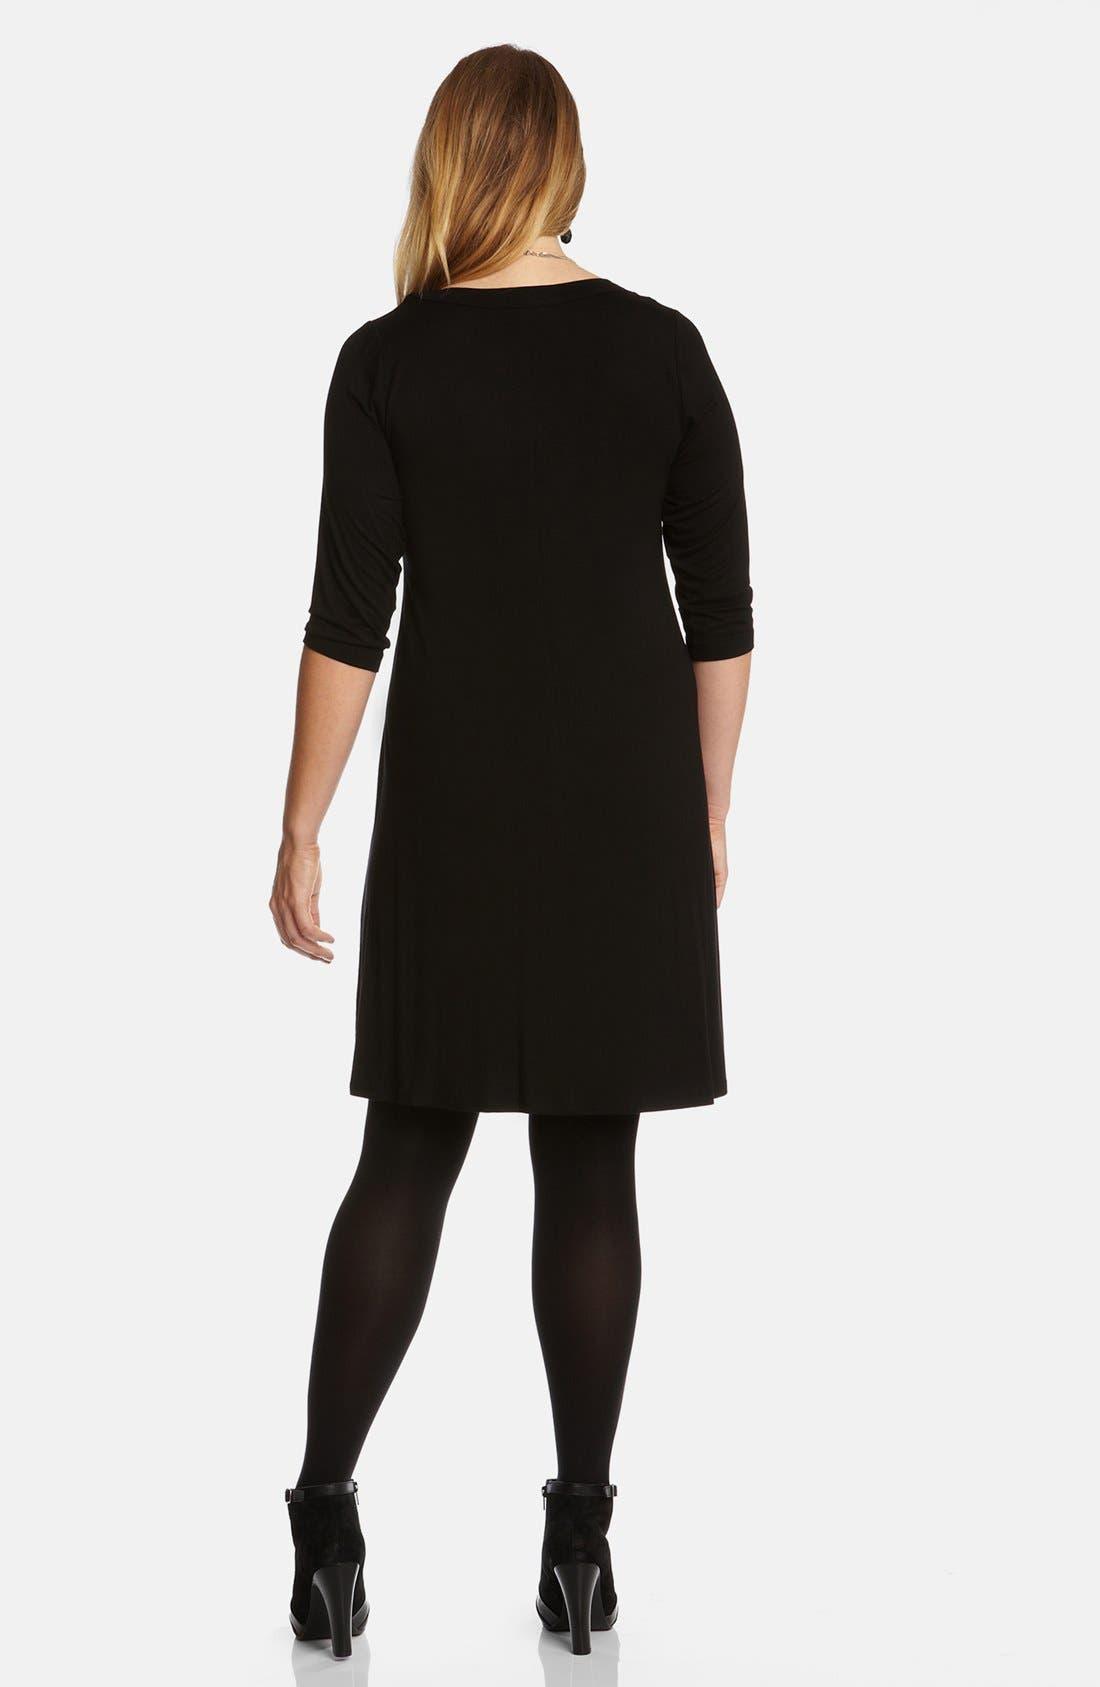 KAREN KANE, Scoop Neck Jersey Dress, Alternate thumbnail 3, color, BLACK